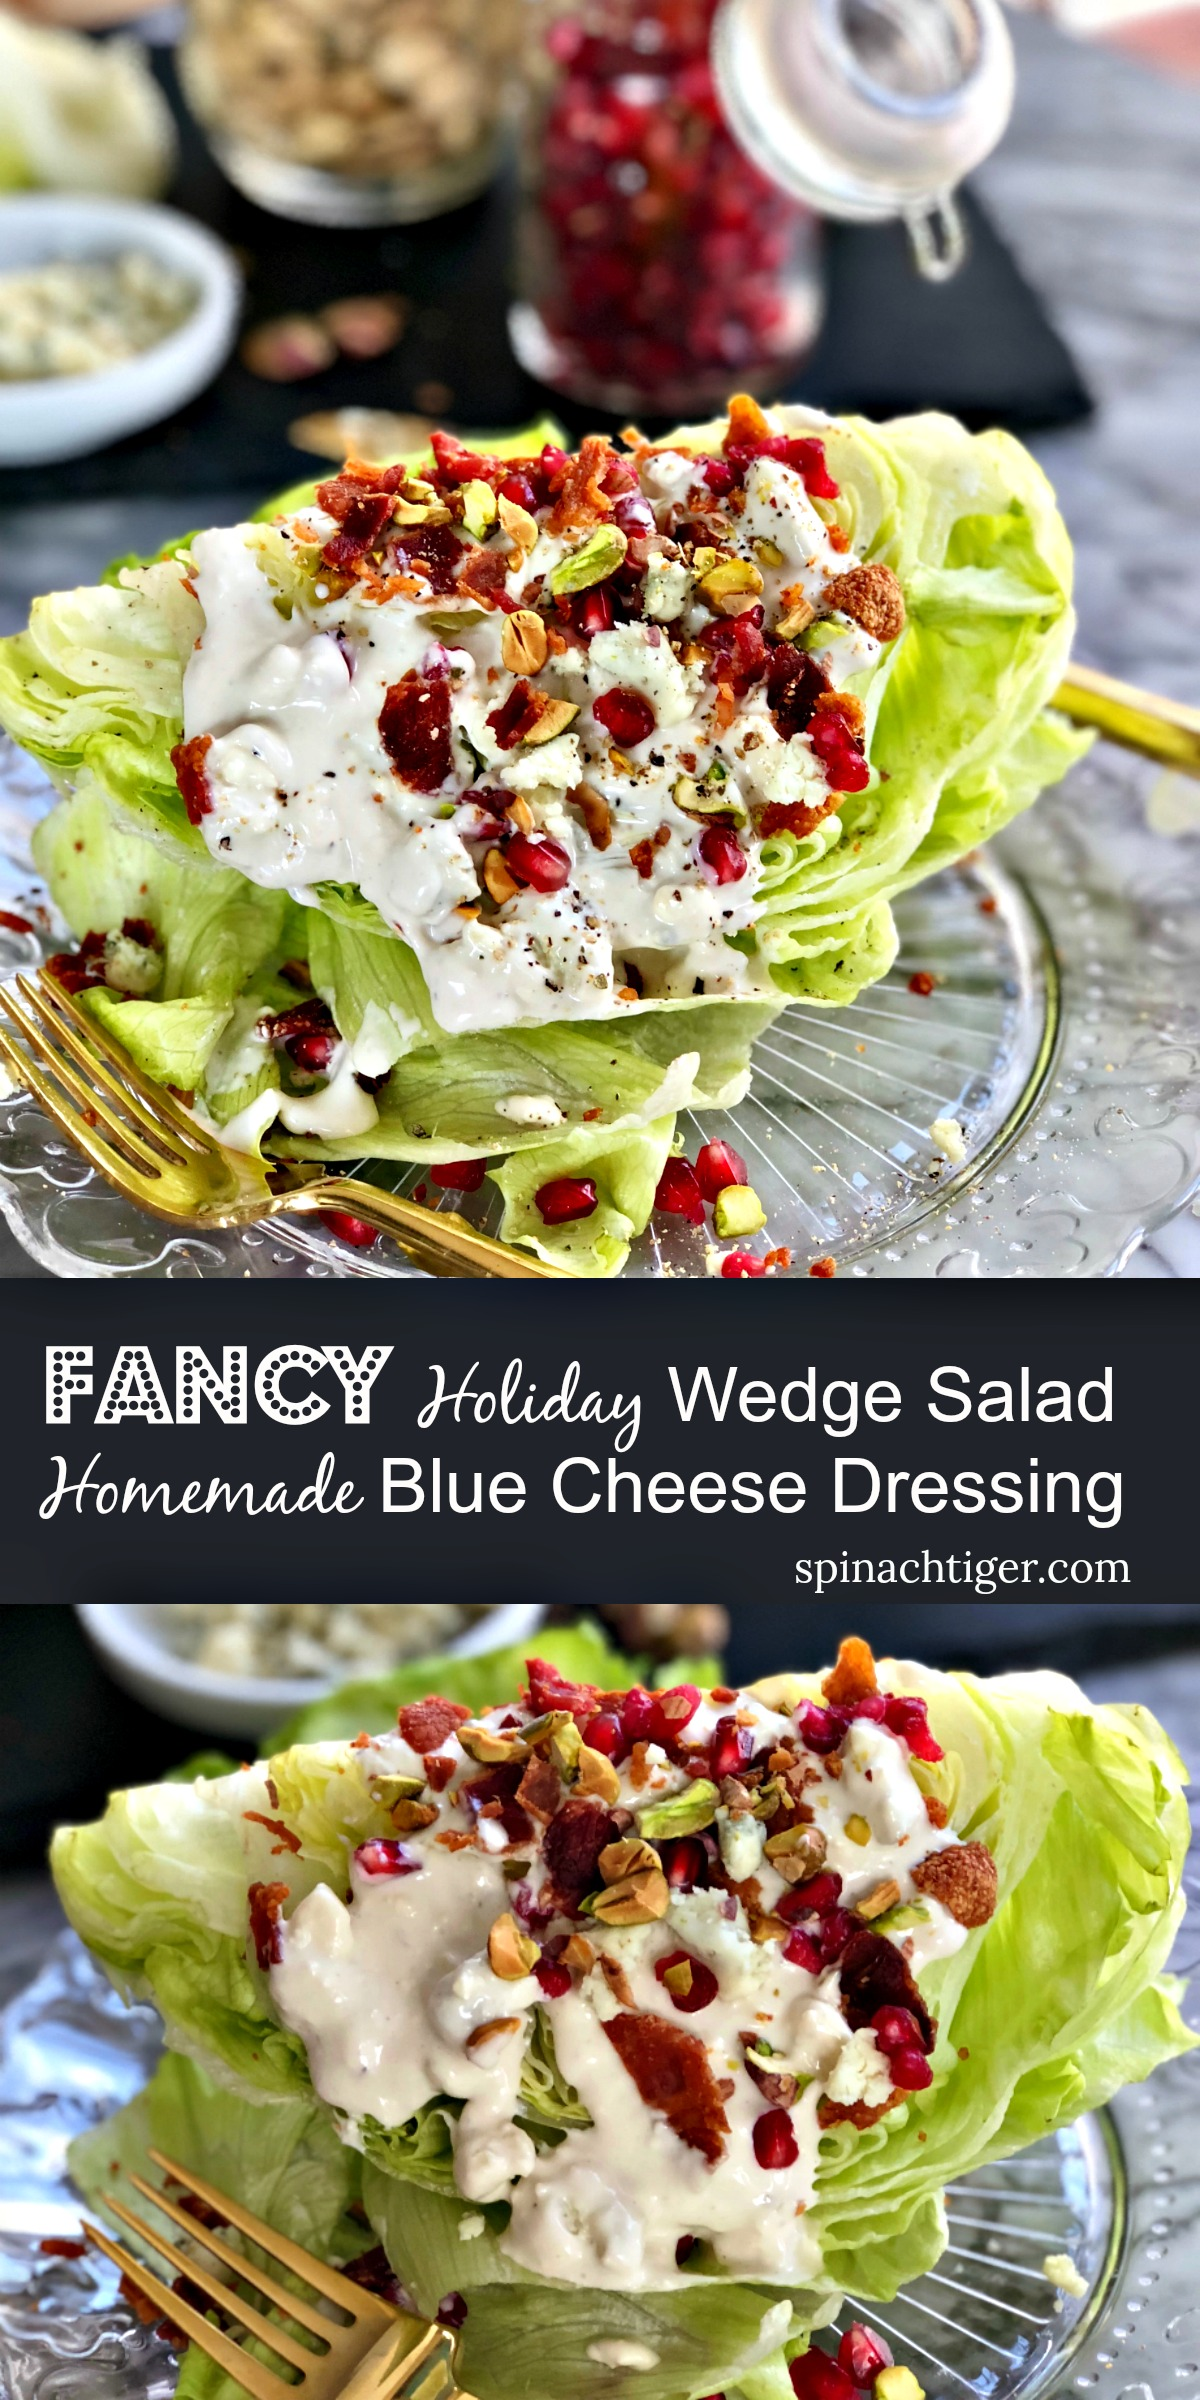 Make classic wedge salad with homemade blue cheese Dressing. #bluecheesedressing #wedgesalad  via @angelaroberts